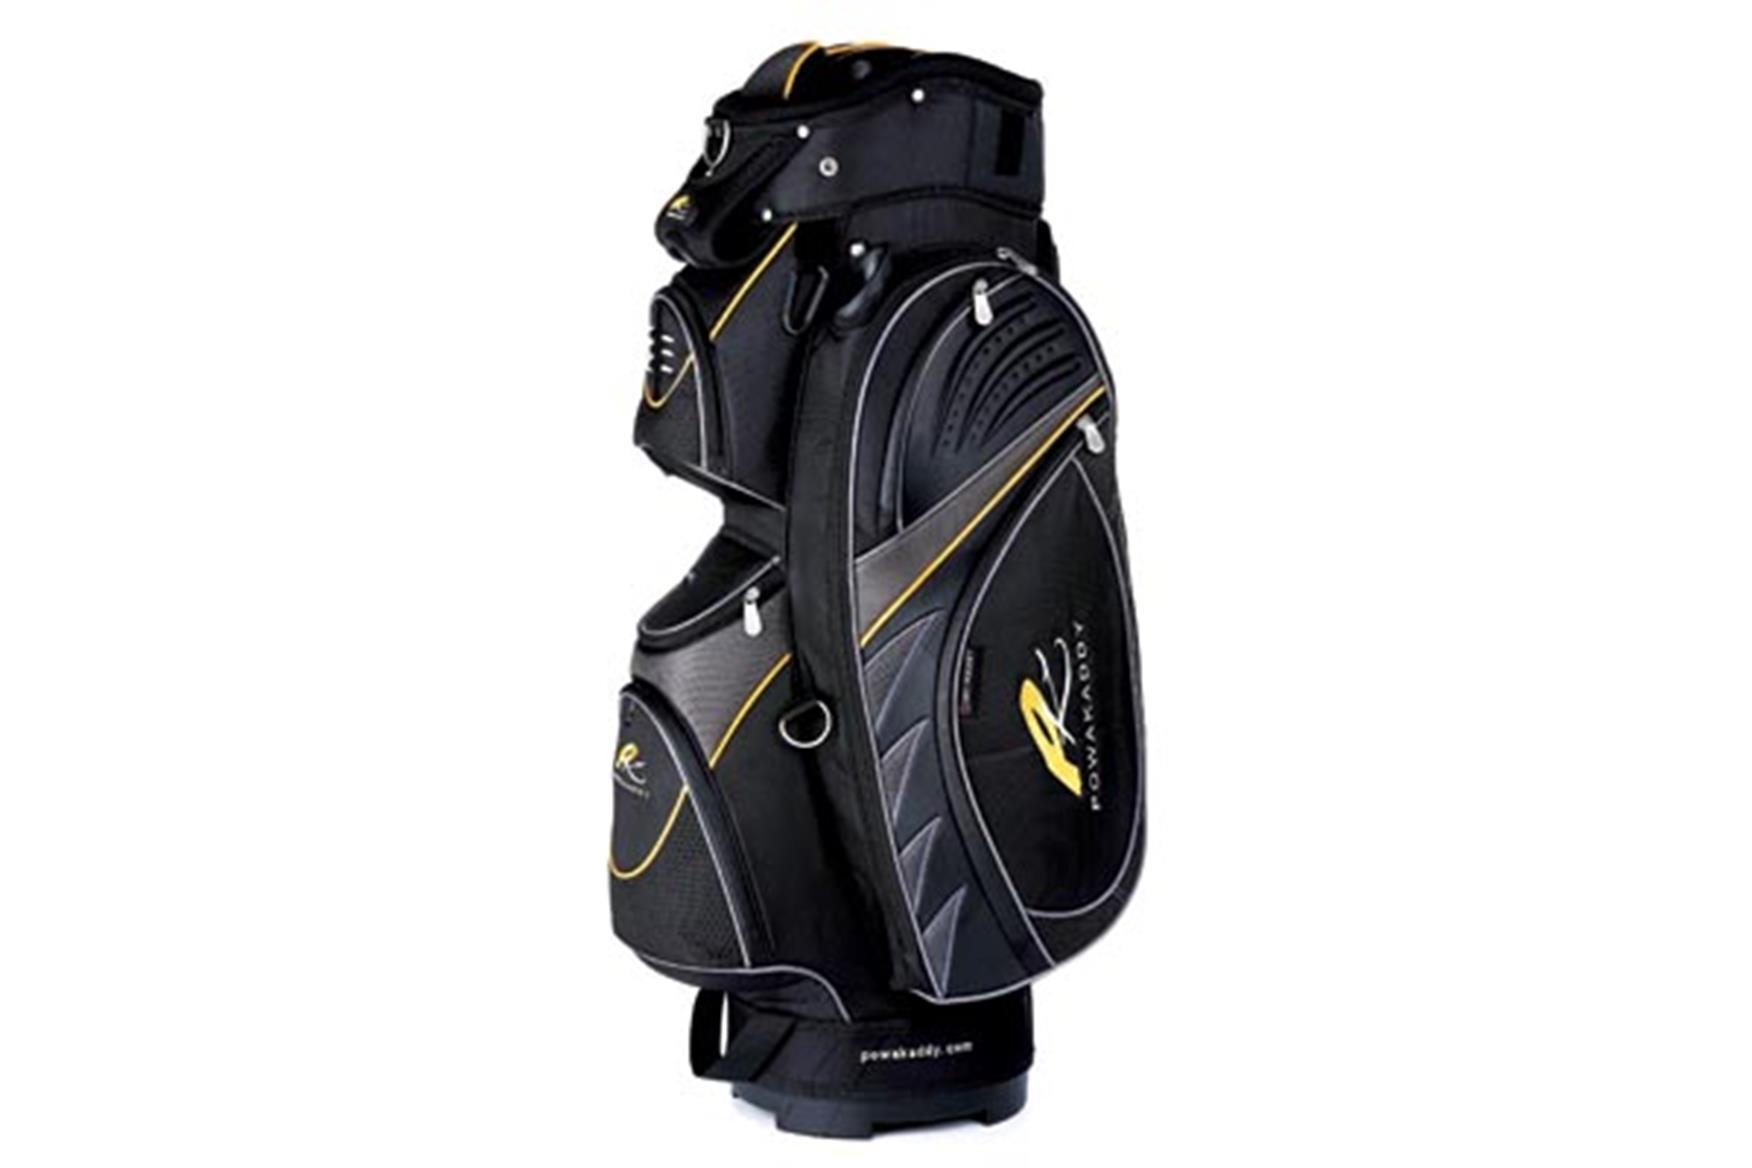 3d1ff6620c3c Powakaddy Sports III Cart Bag Review